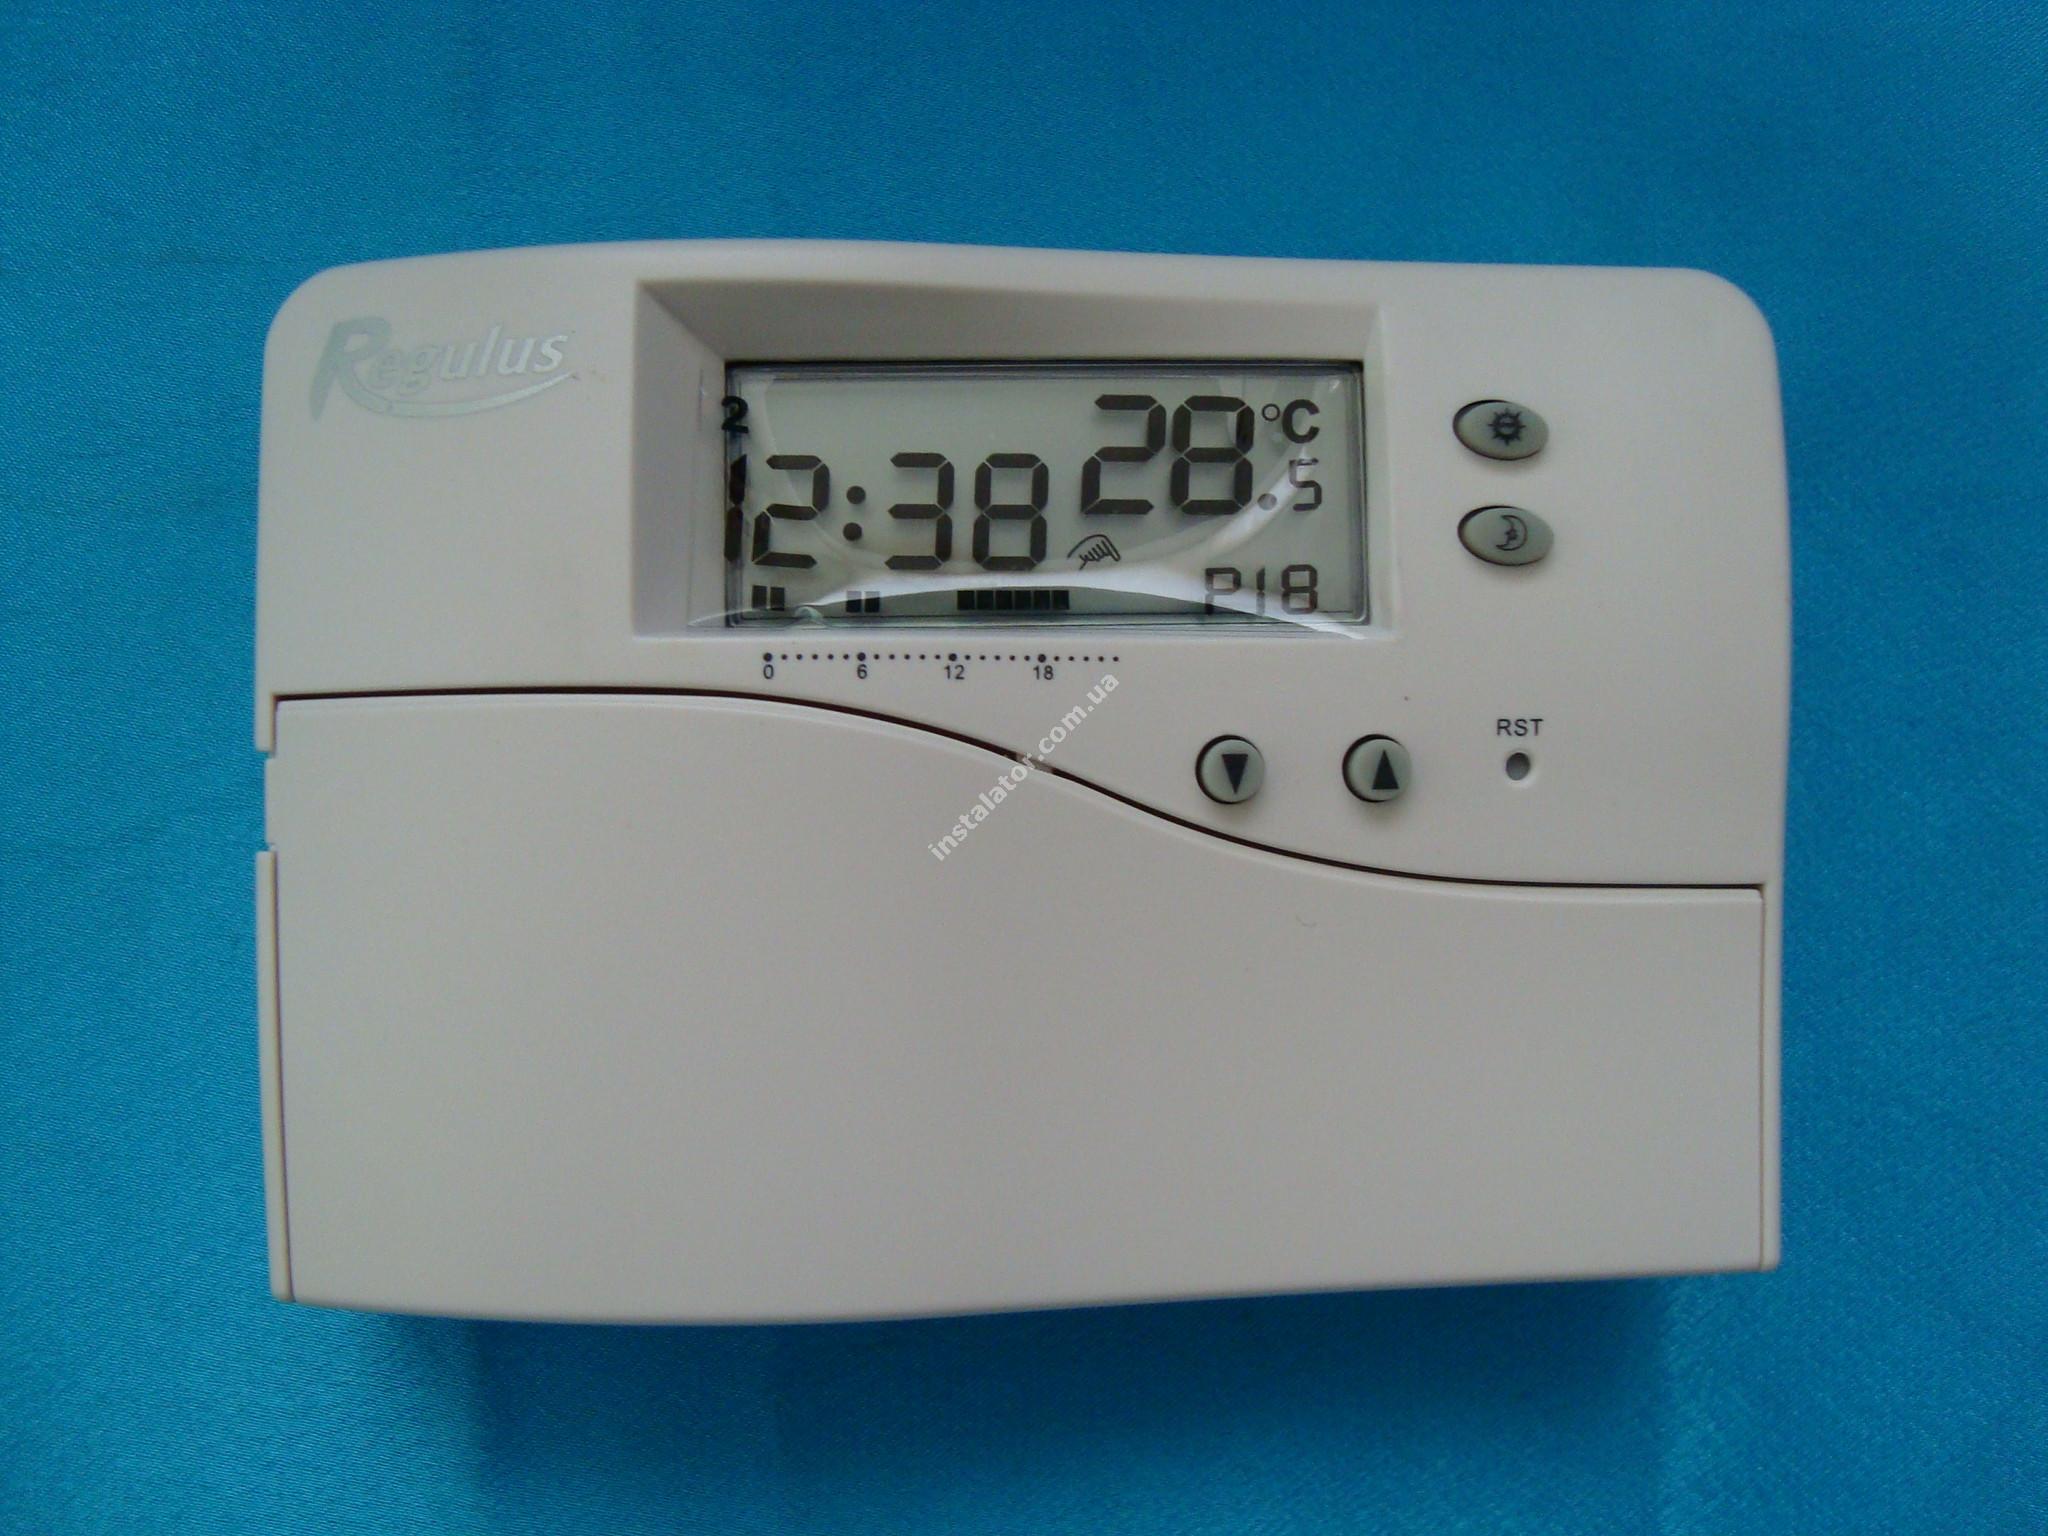 Regulus Термостат - програматор TPO8